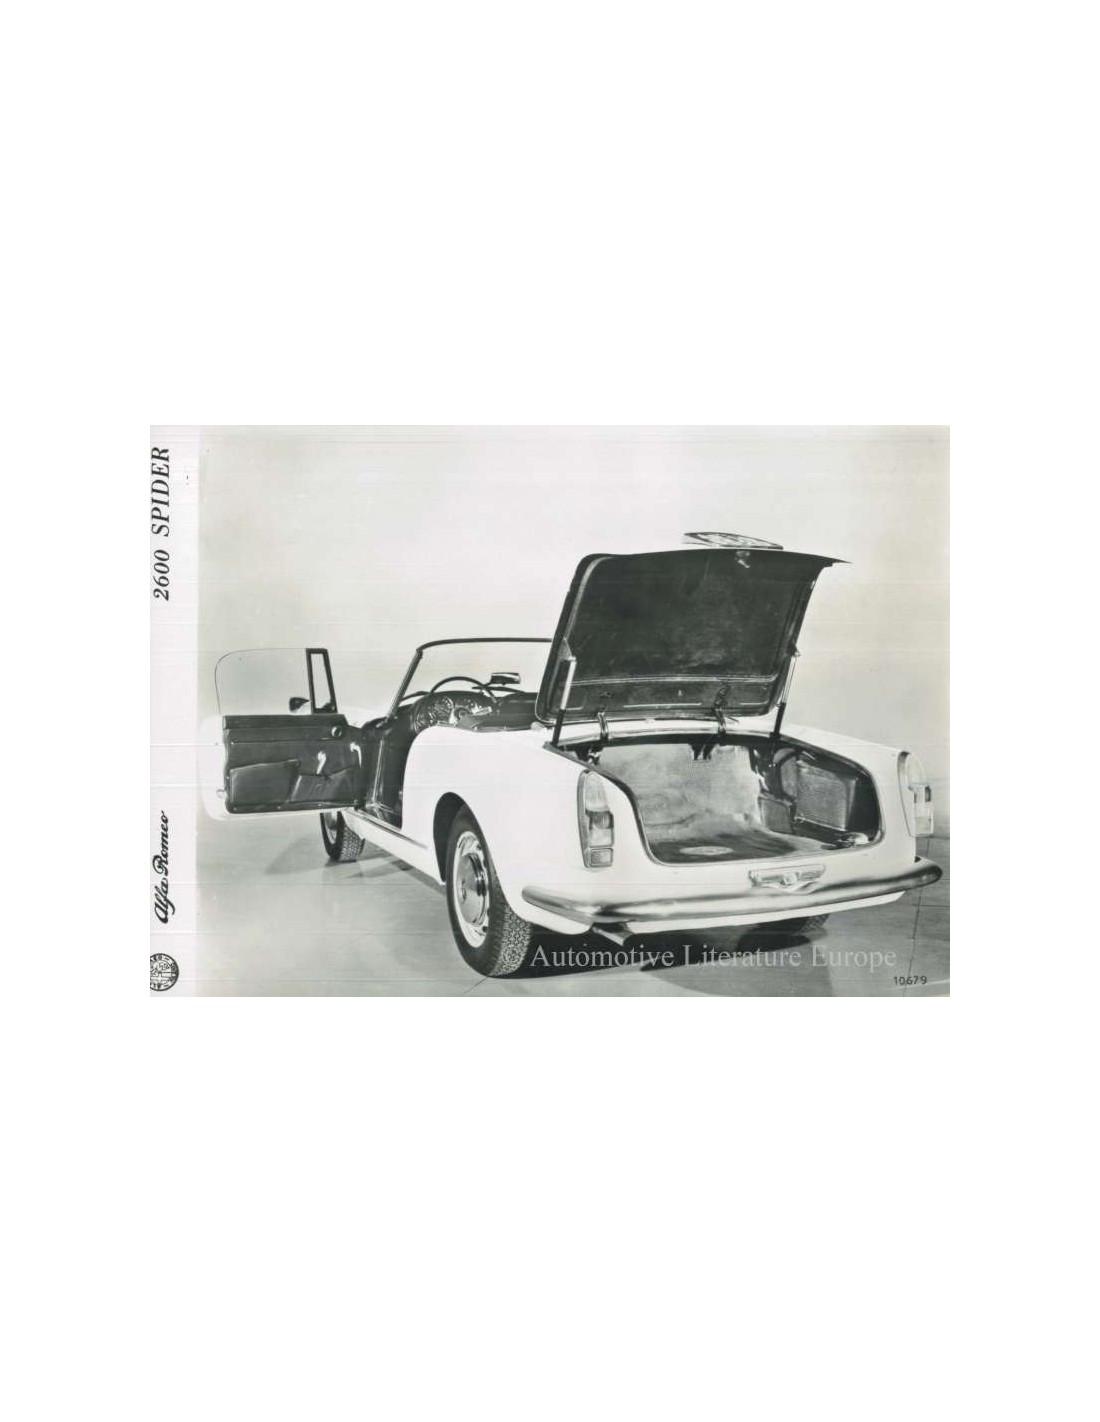 1963 ALFA ROMEO 2600 SPYDER PRESS PHOTO